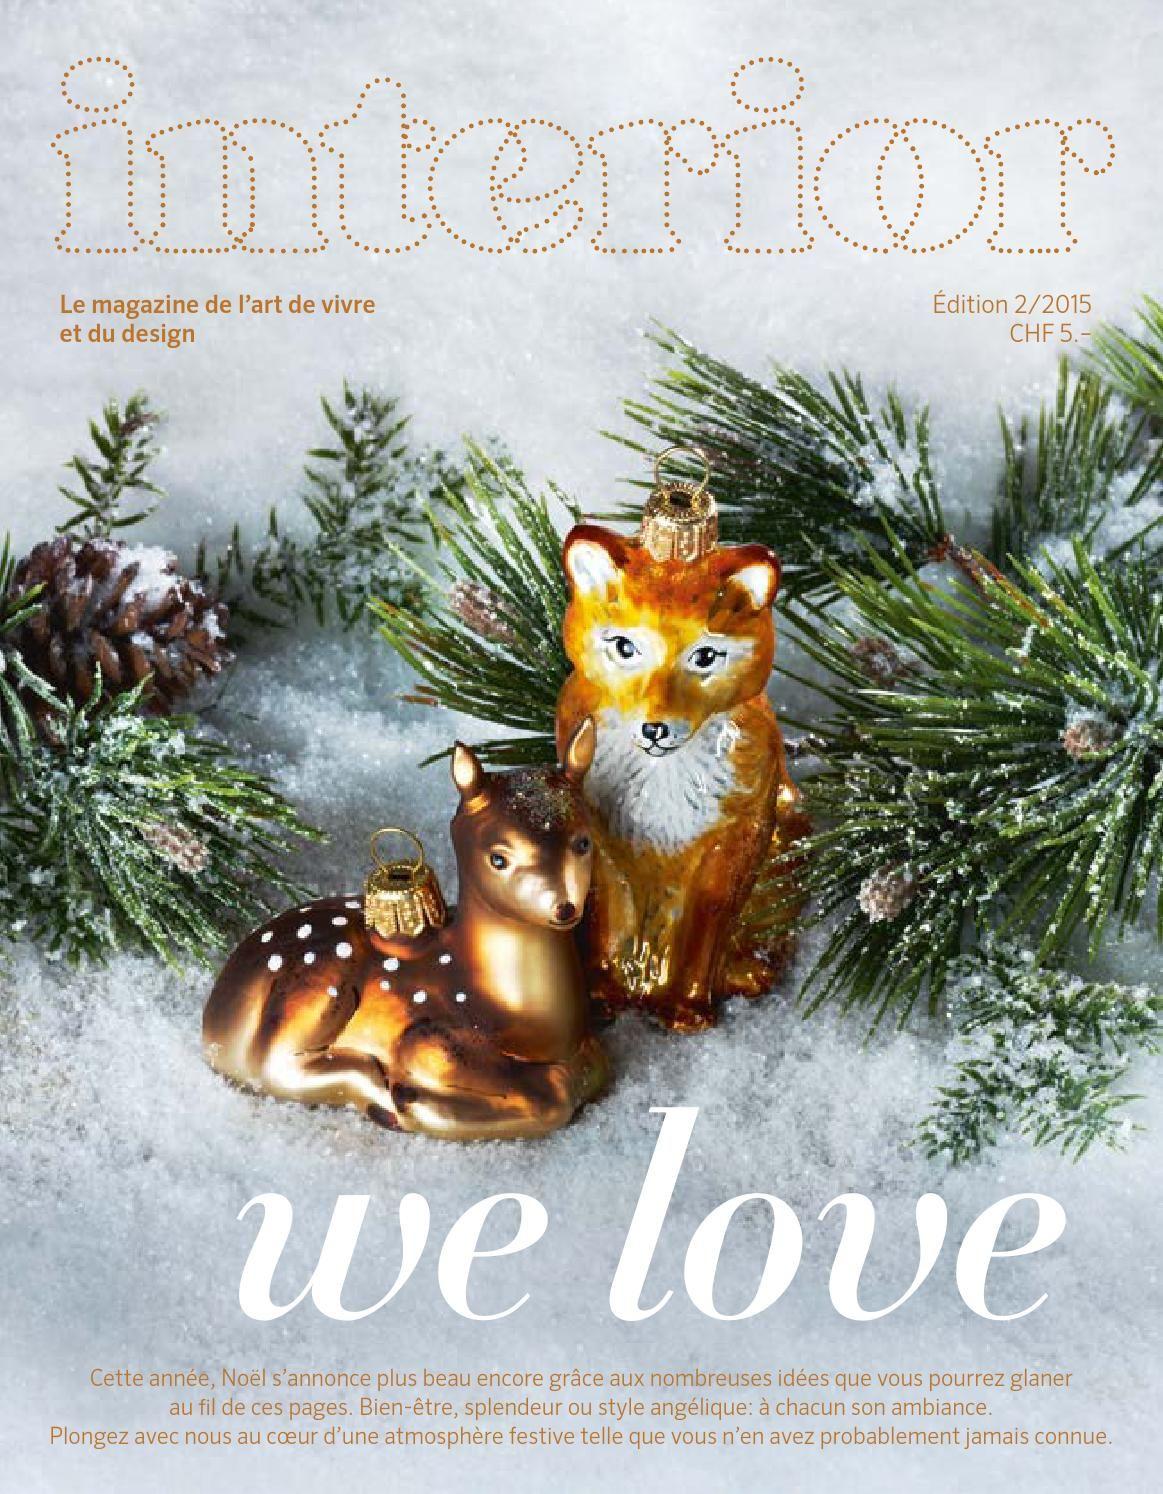 interior magazine édition 2/2015 Christmas art